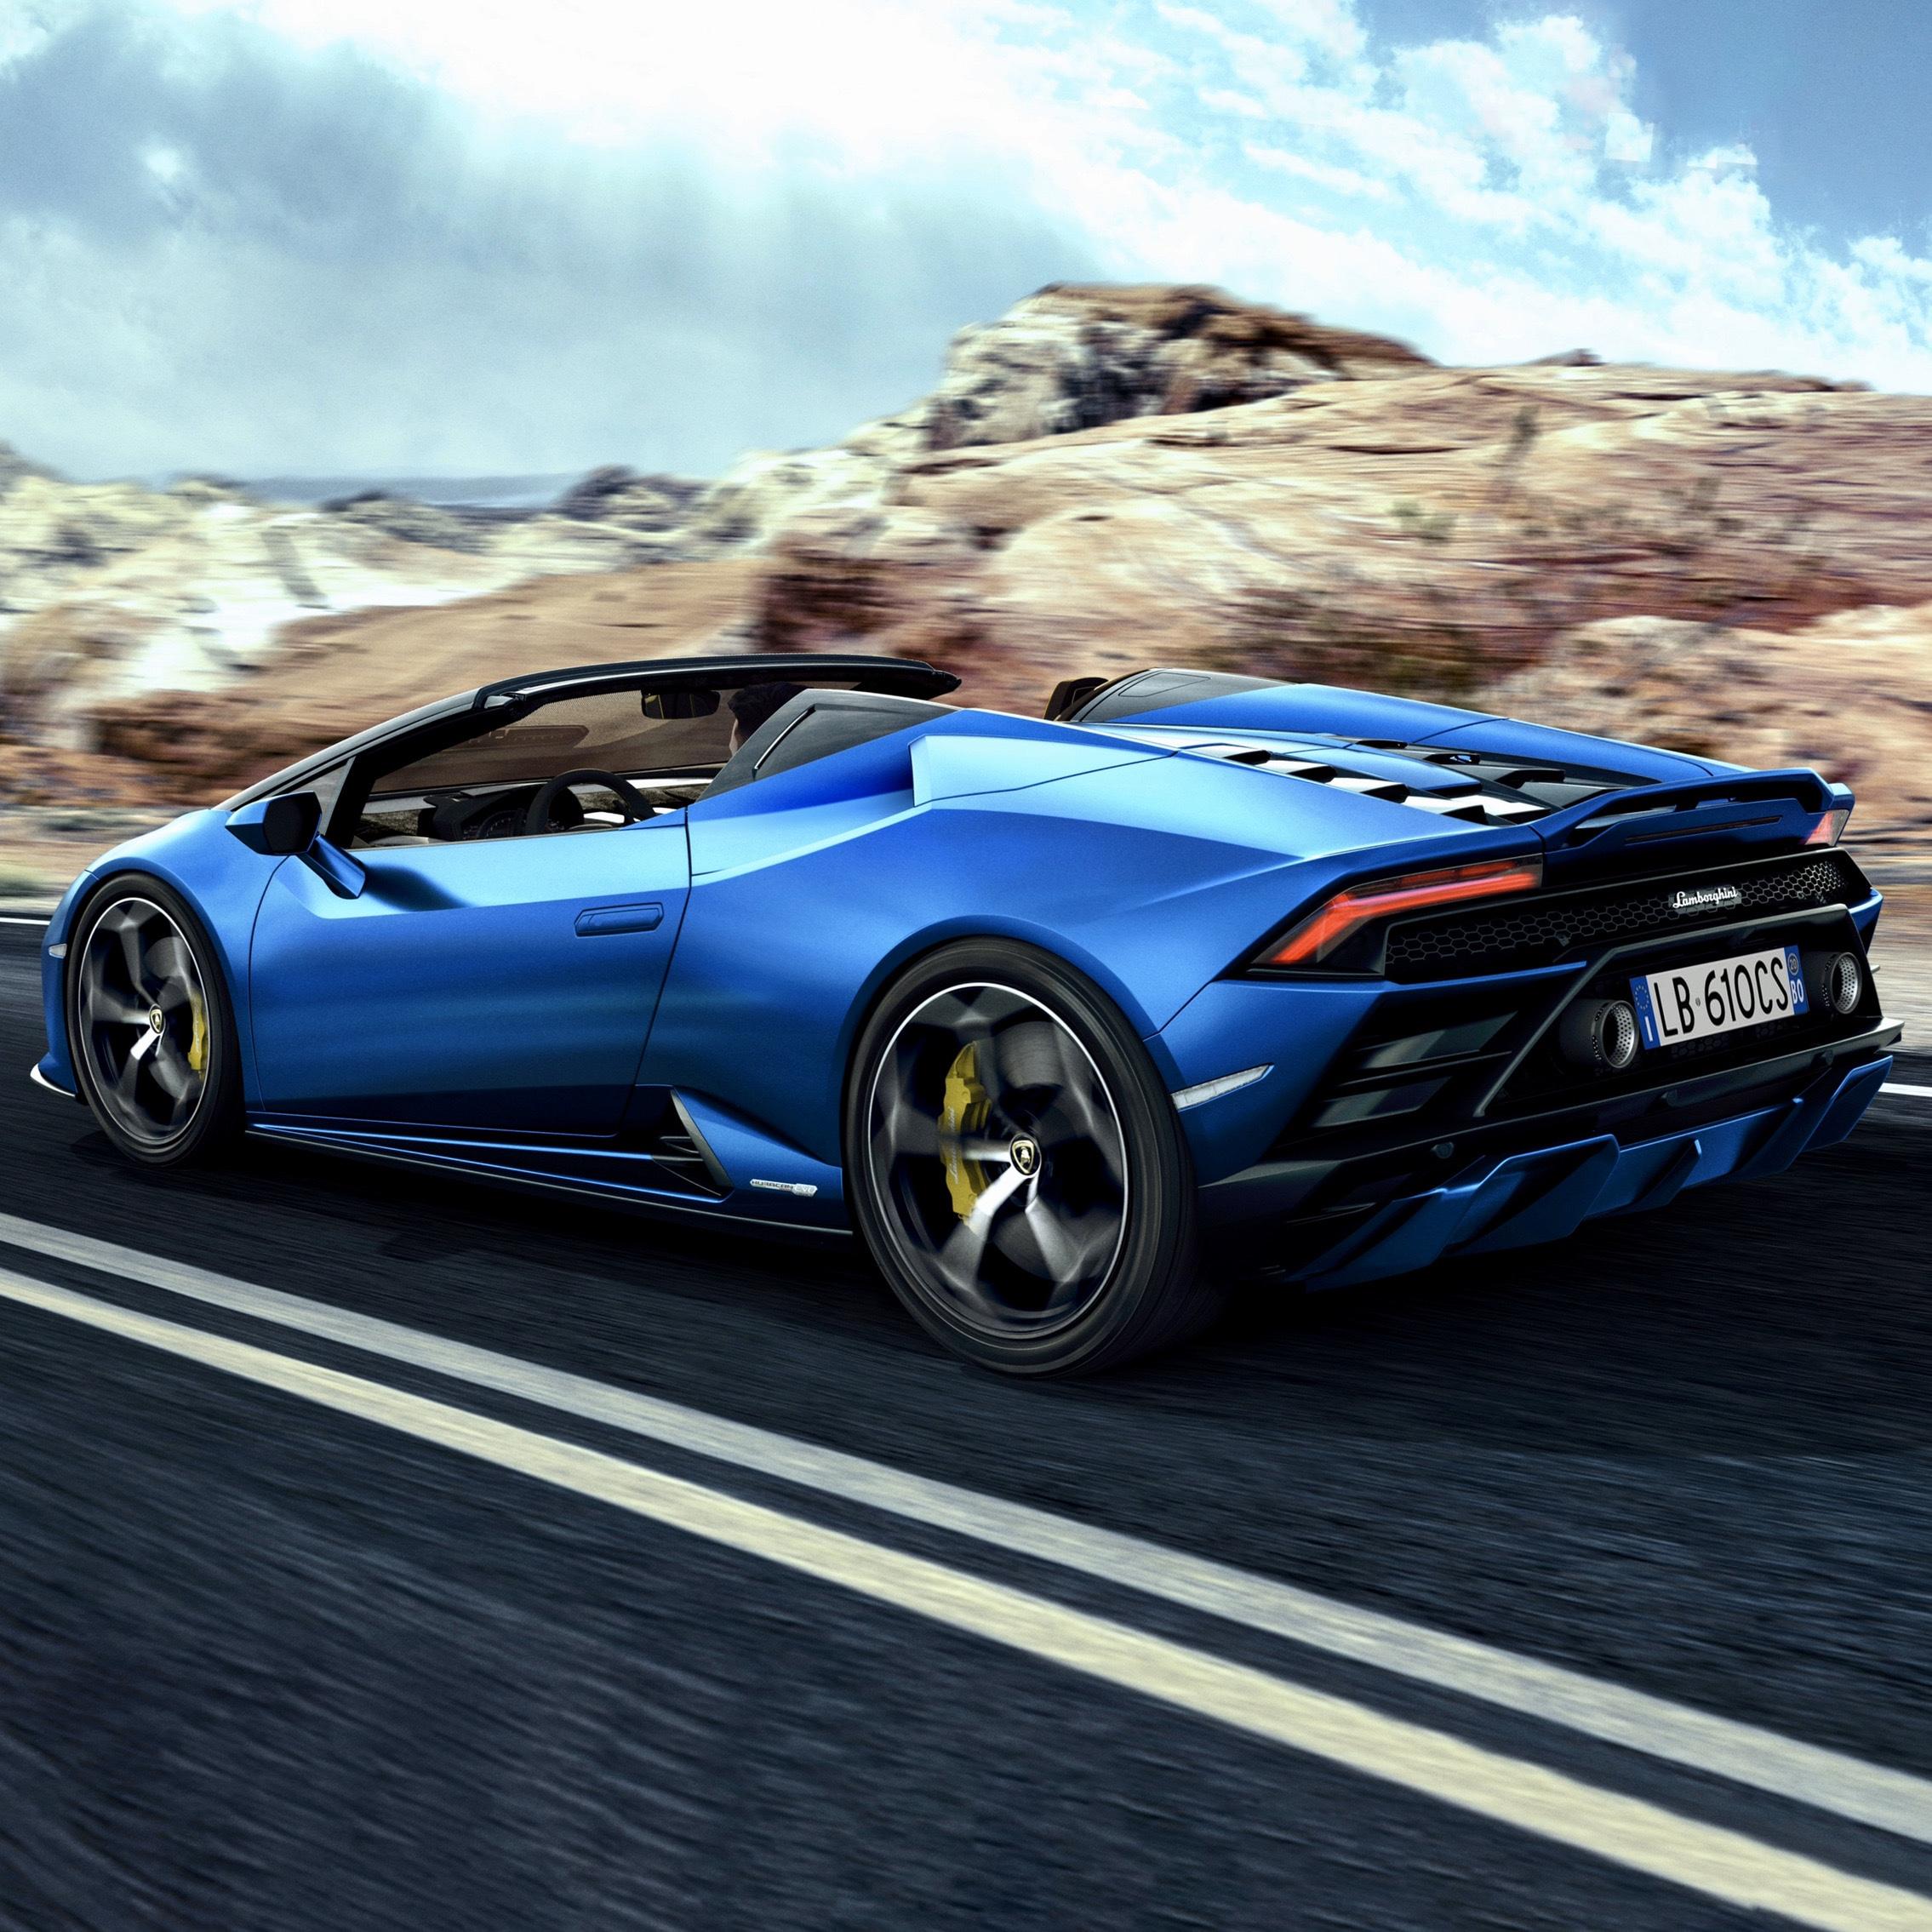 Lamborghini Reveals New Huracan EVO RWD Spyder • Hype Garage